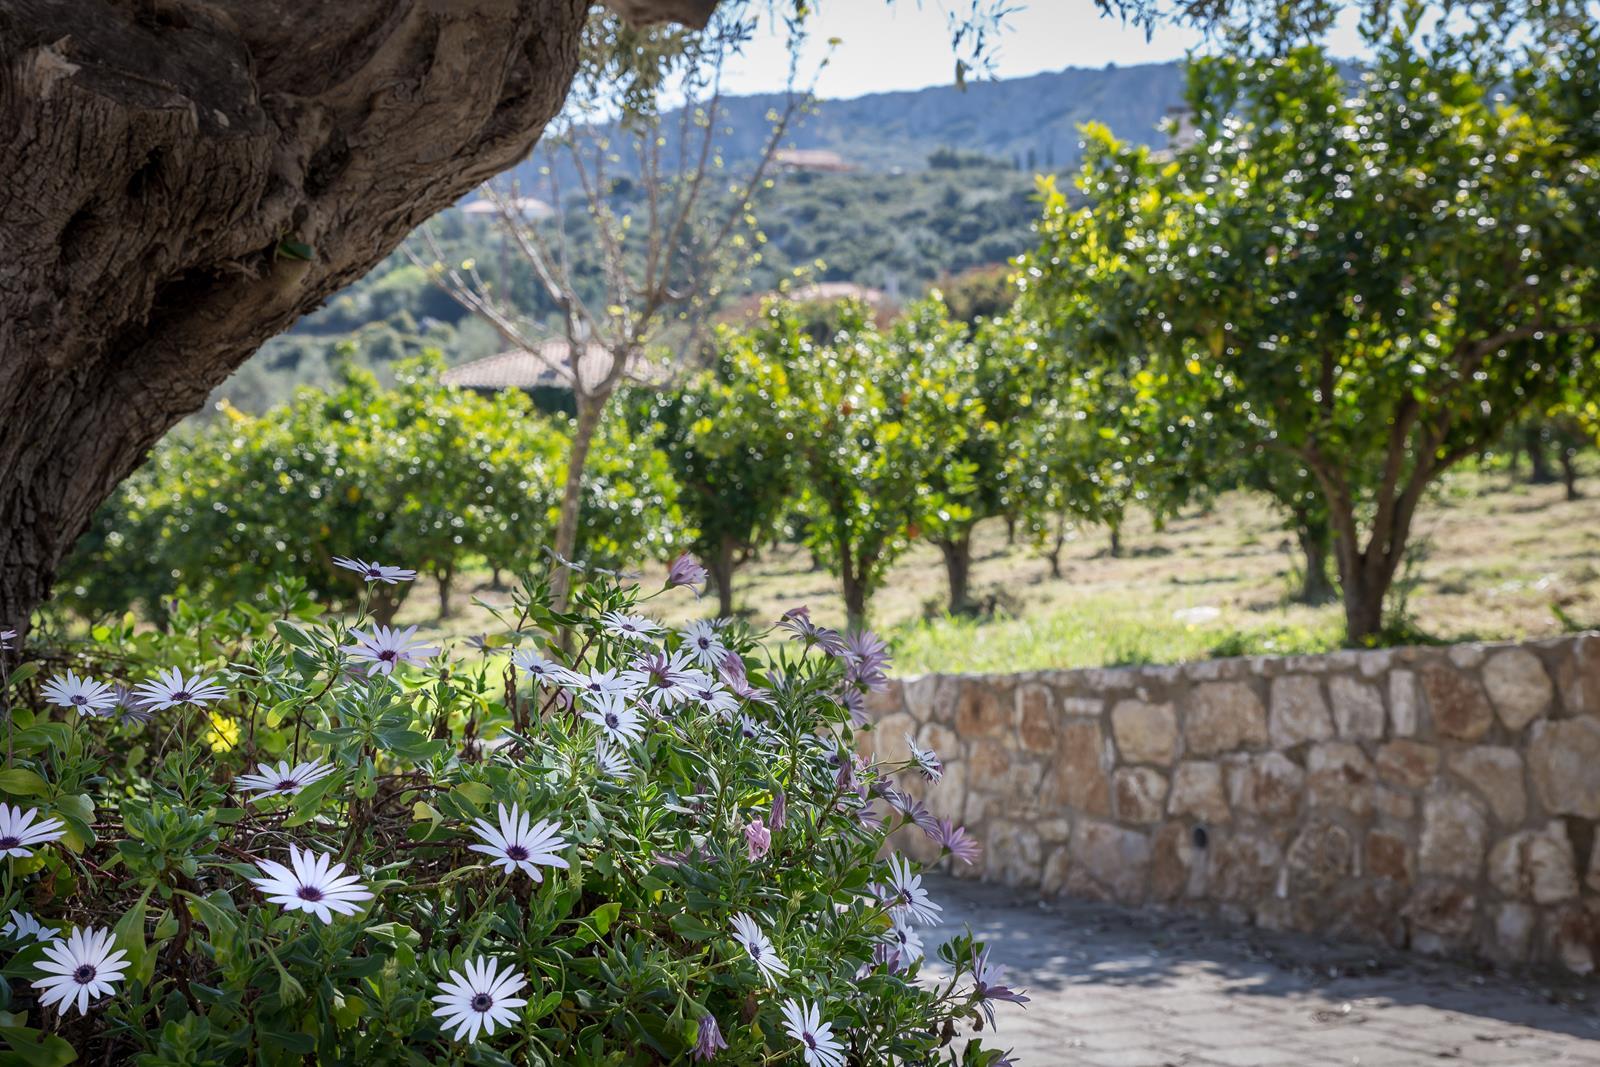 sights in Nafplio Greece - Klymeni Traditional Homes